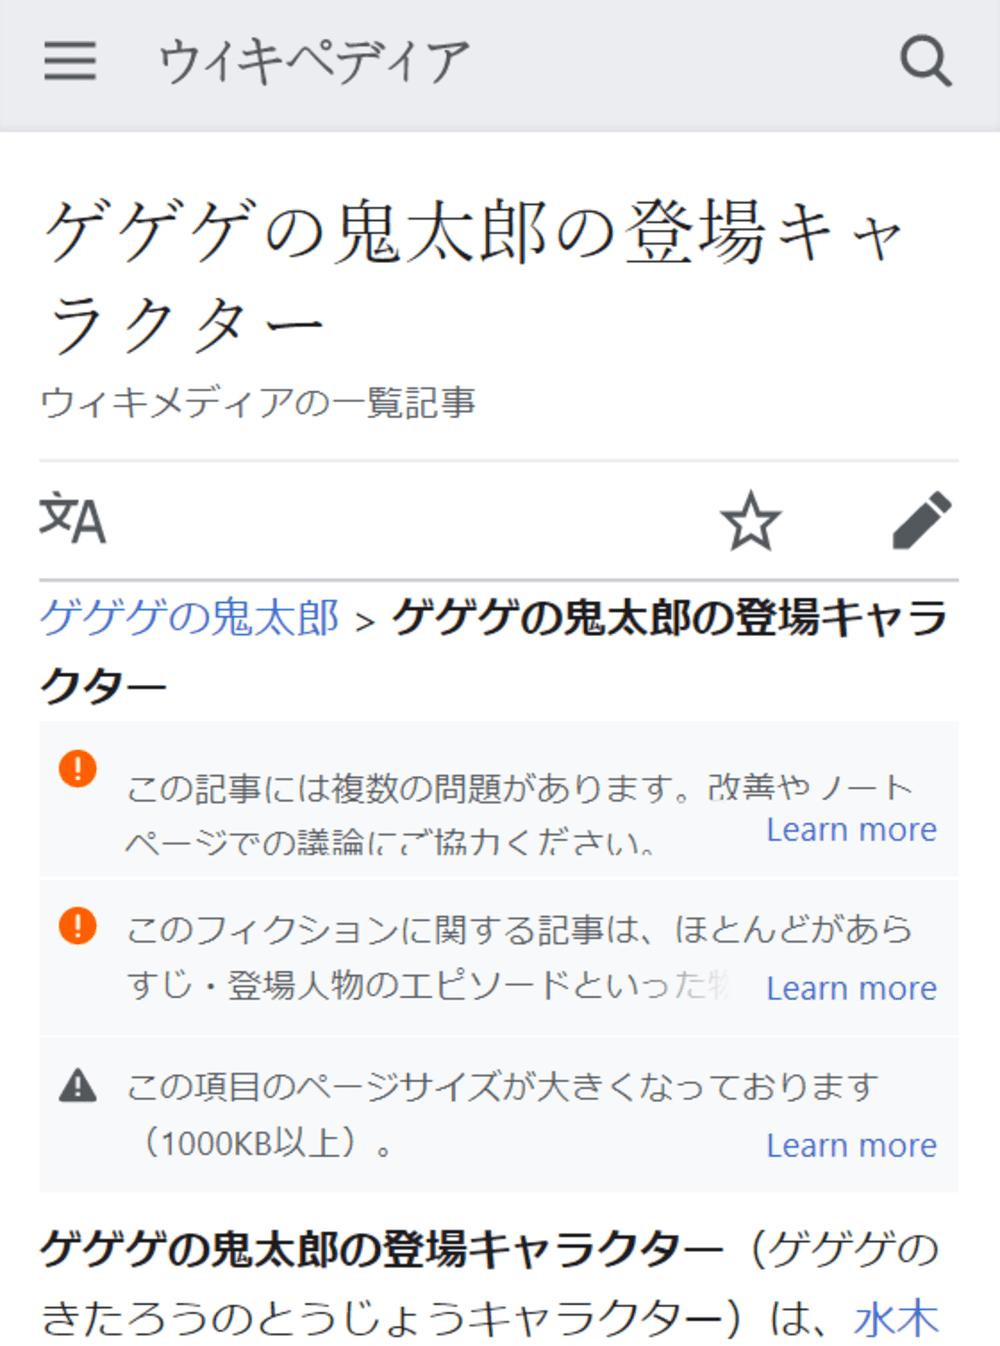 SnapCrab_NoName_2019-6-20_15-25-30_No-00